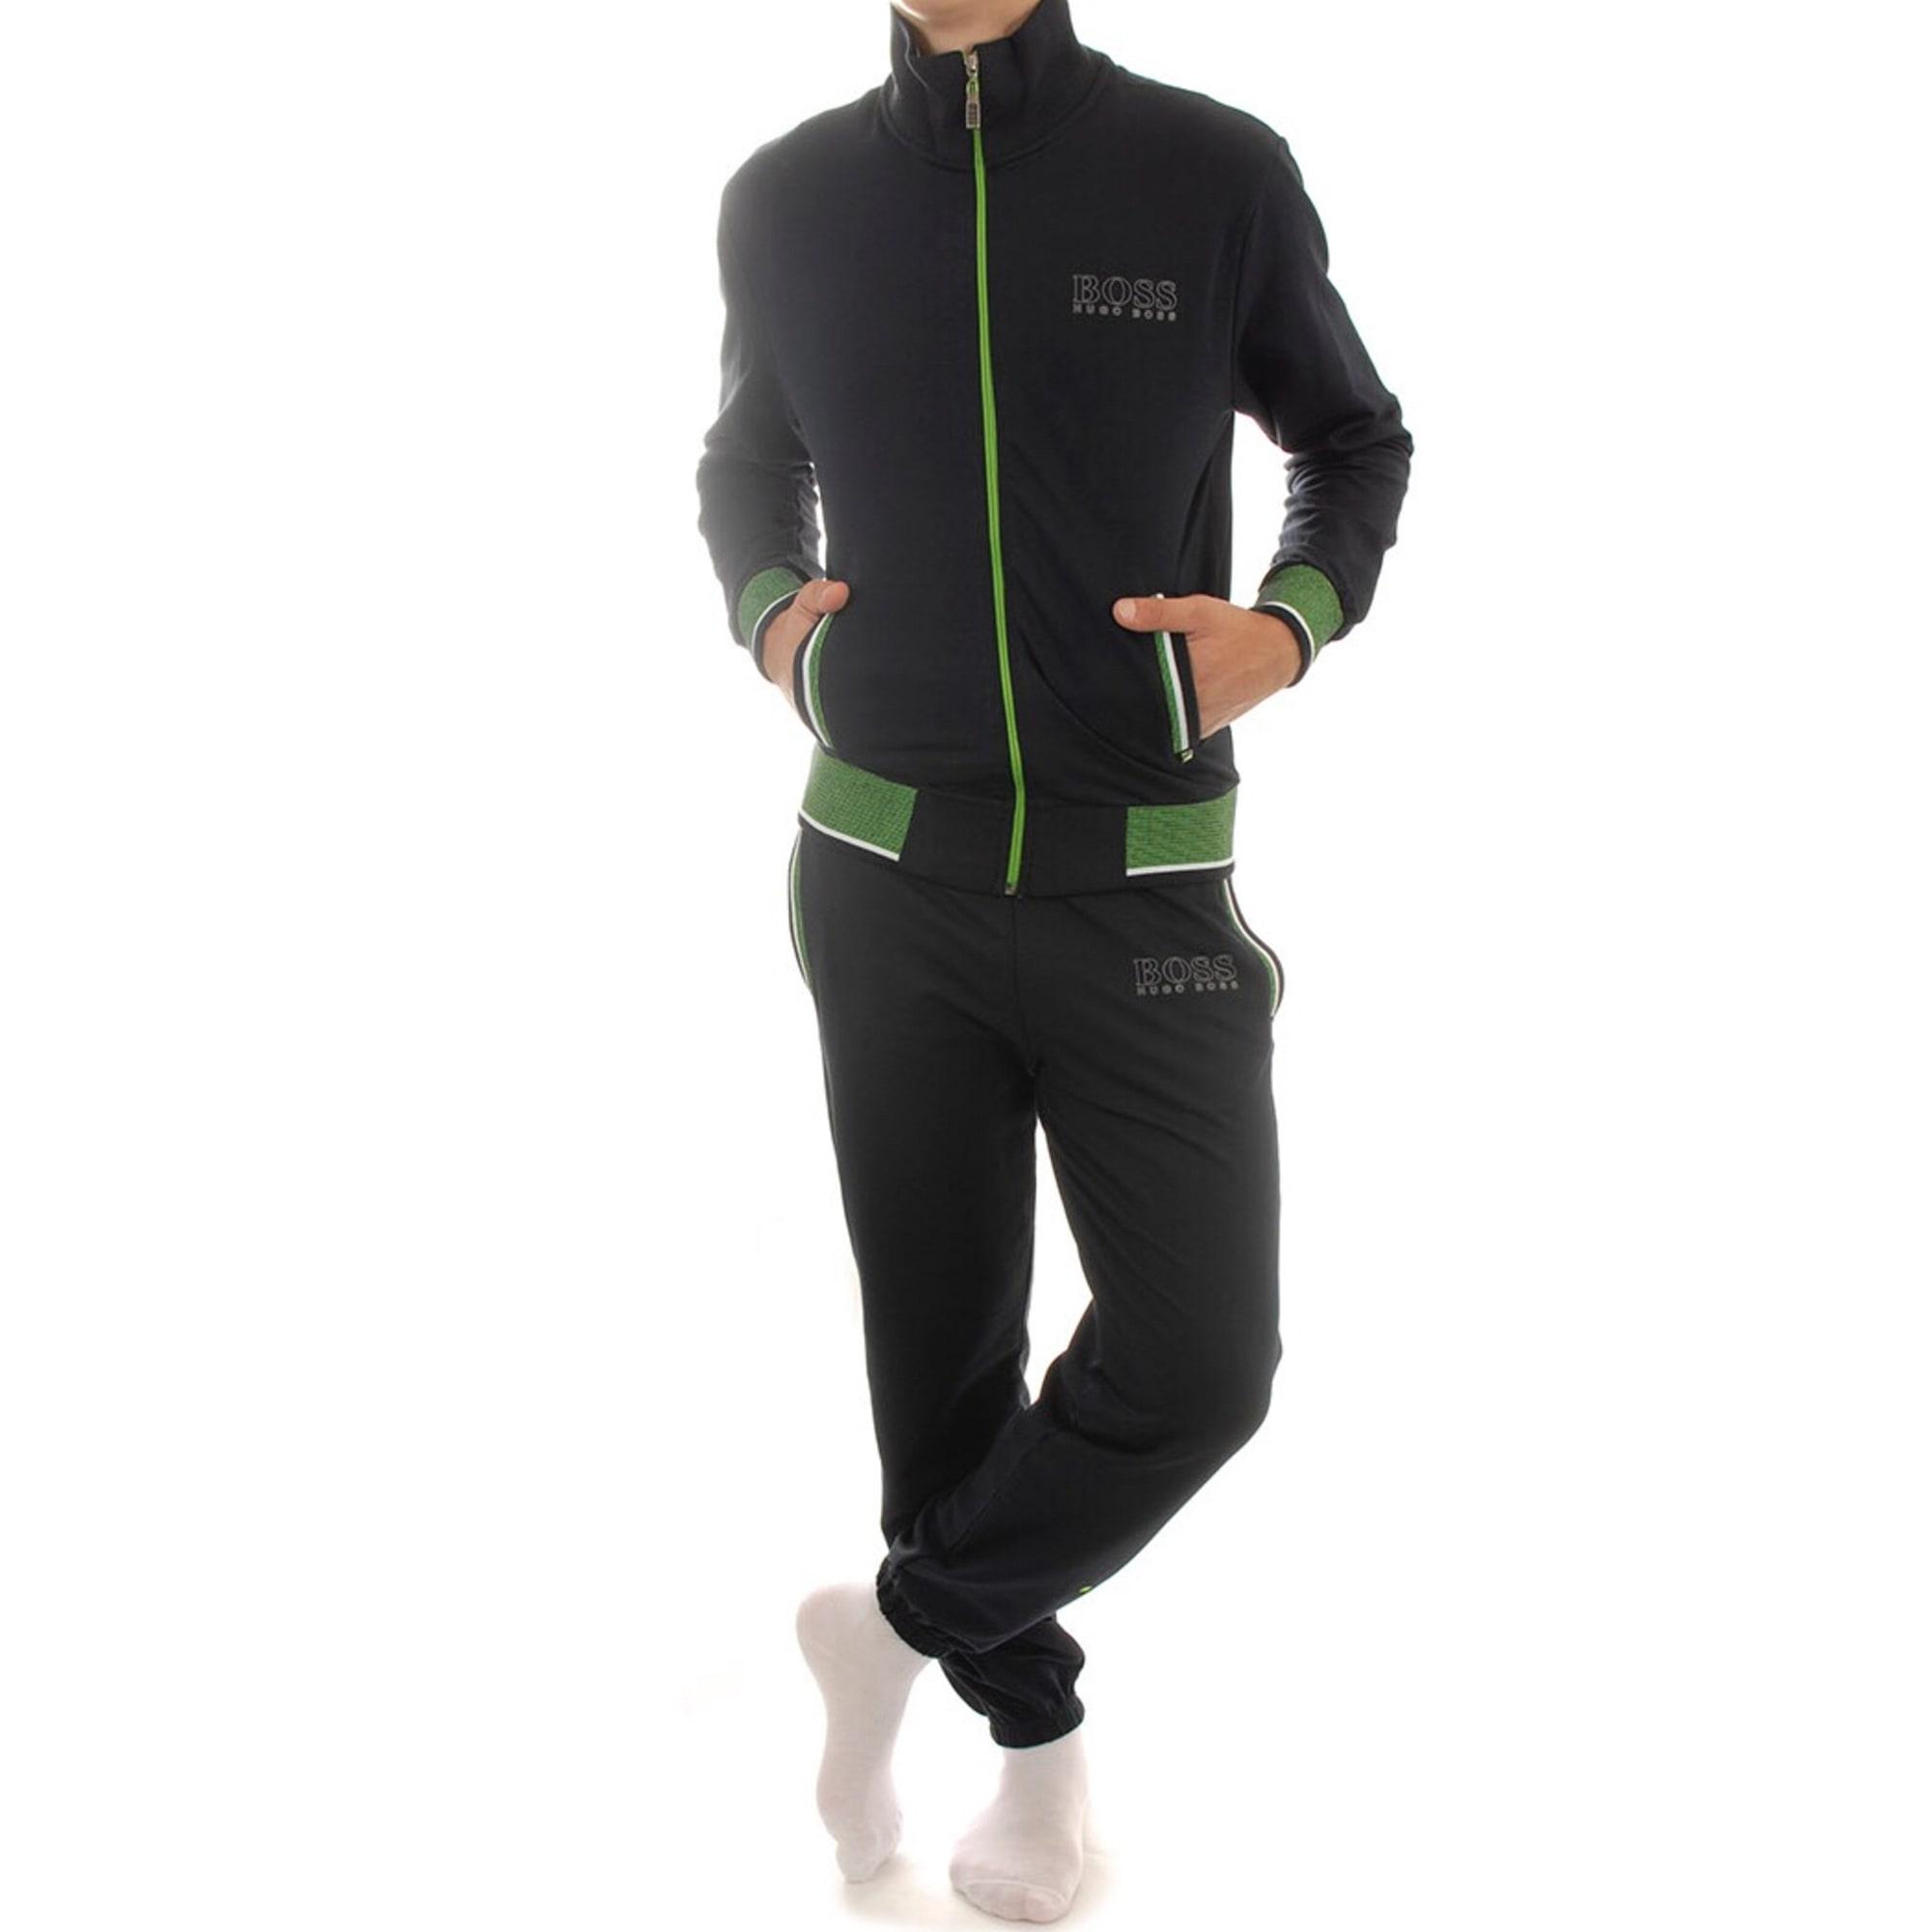 Ensemble jogging HUGO BOSS 56 (XL) bleu vendu